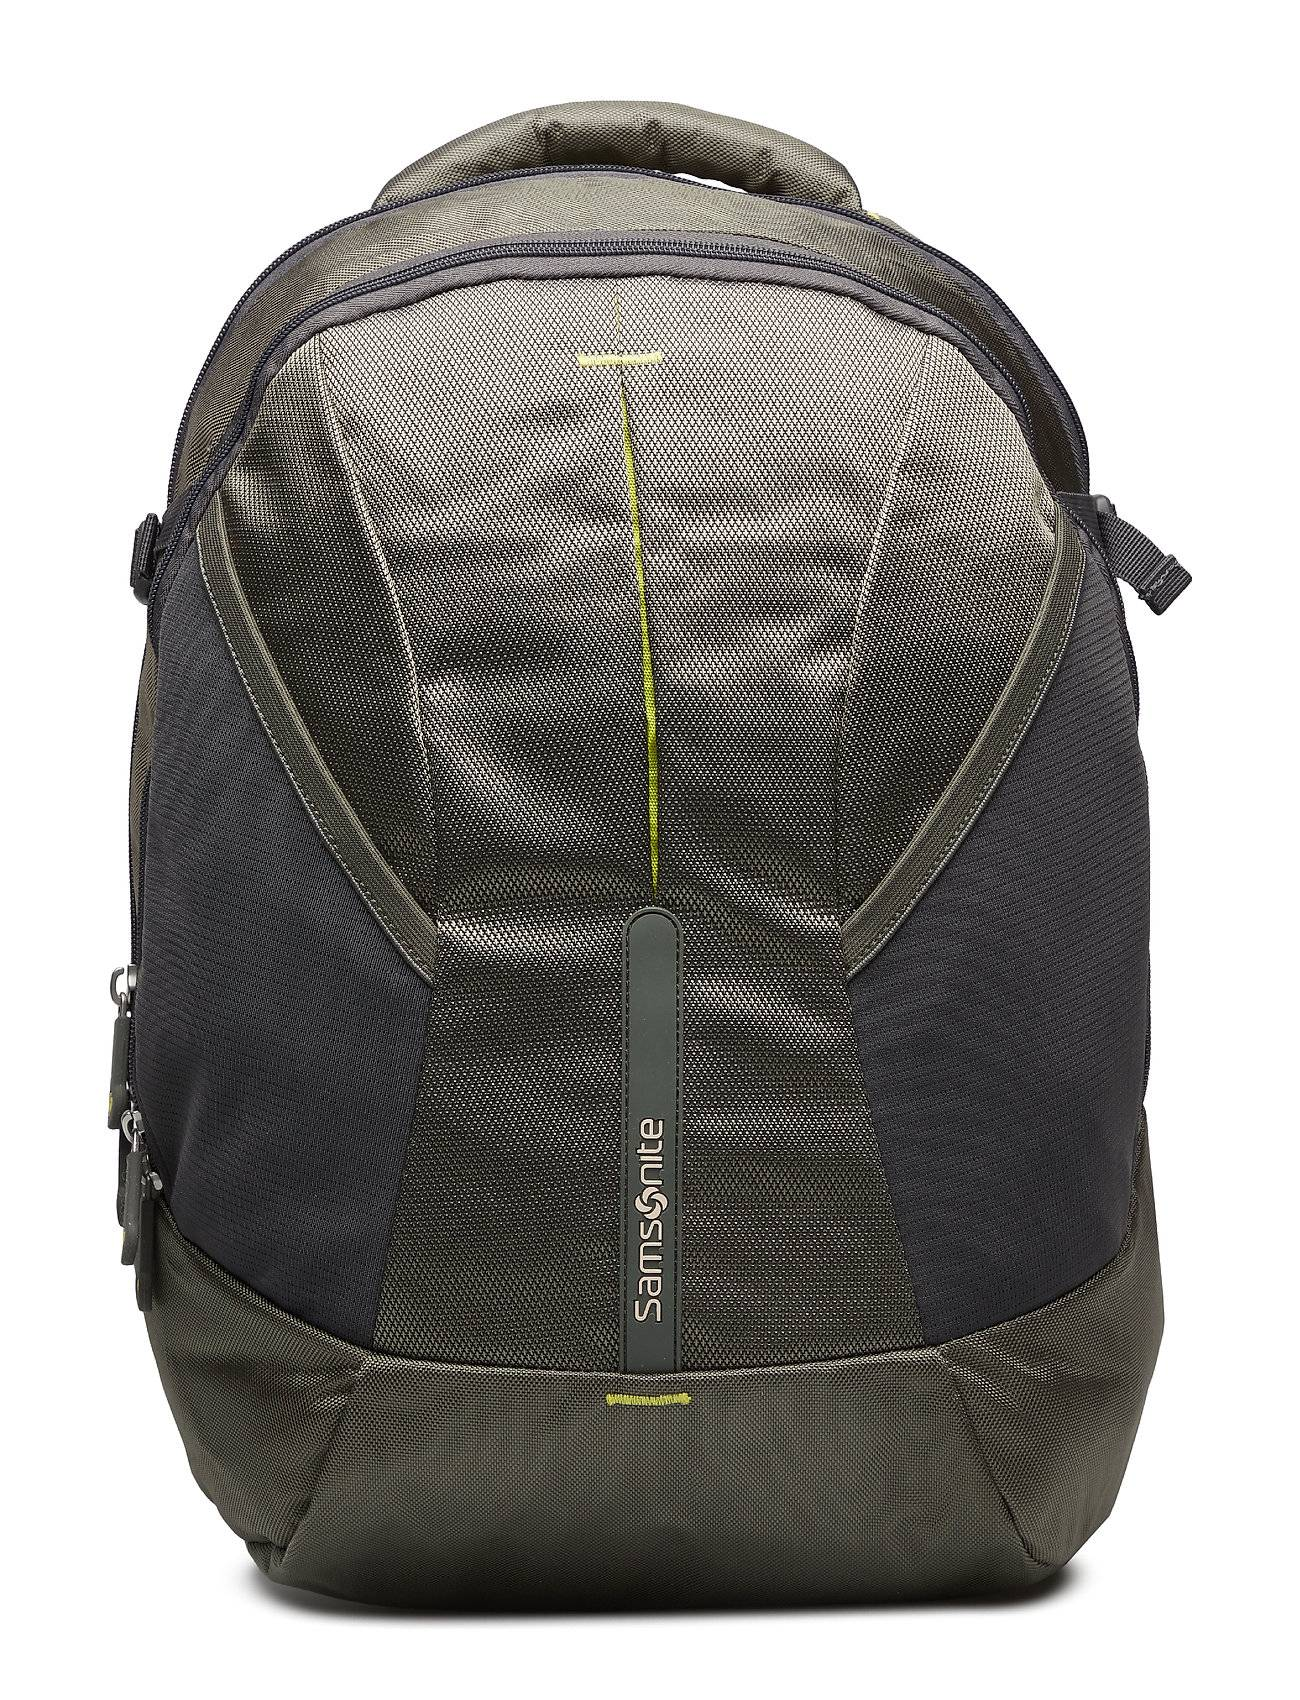 Samsonite 4mation Laptop Backpack M